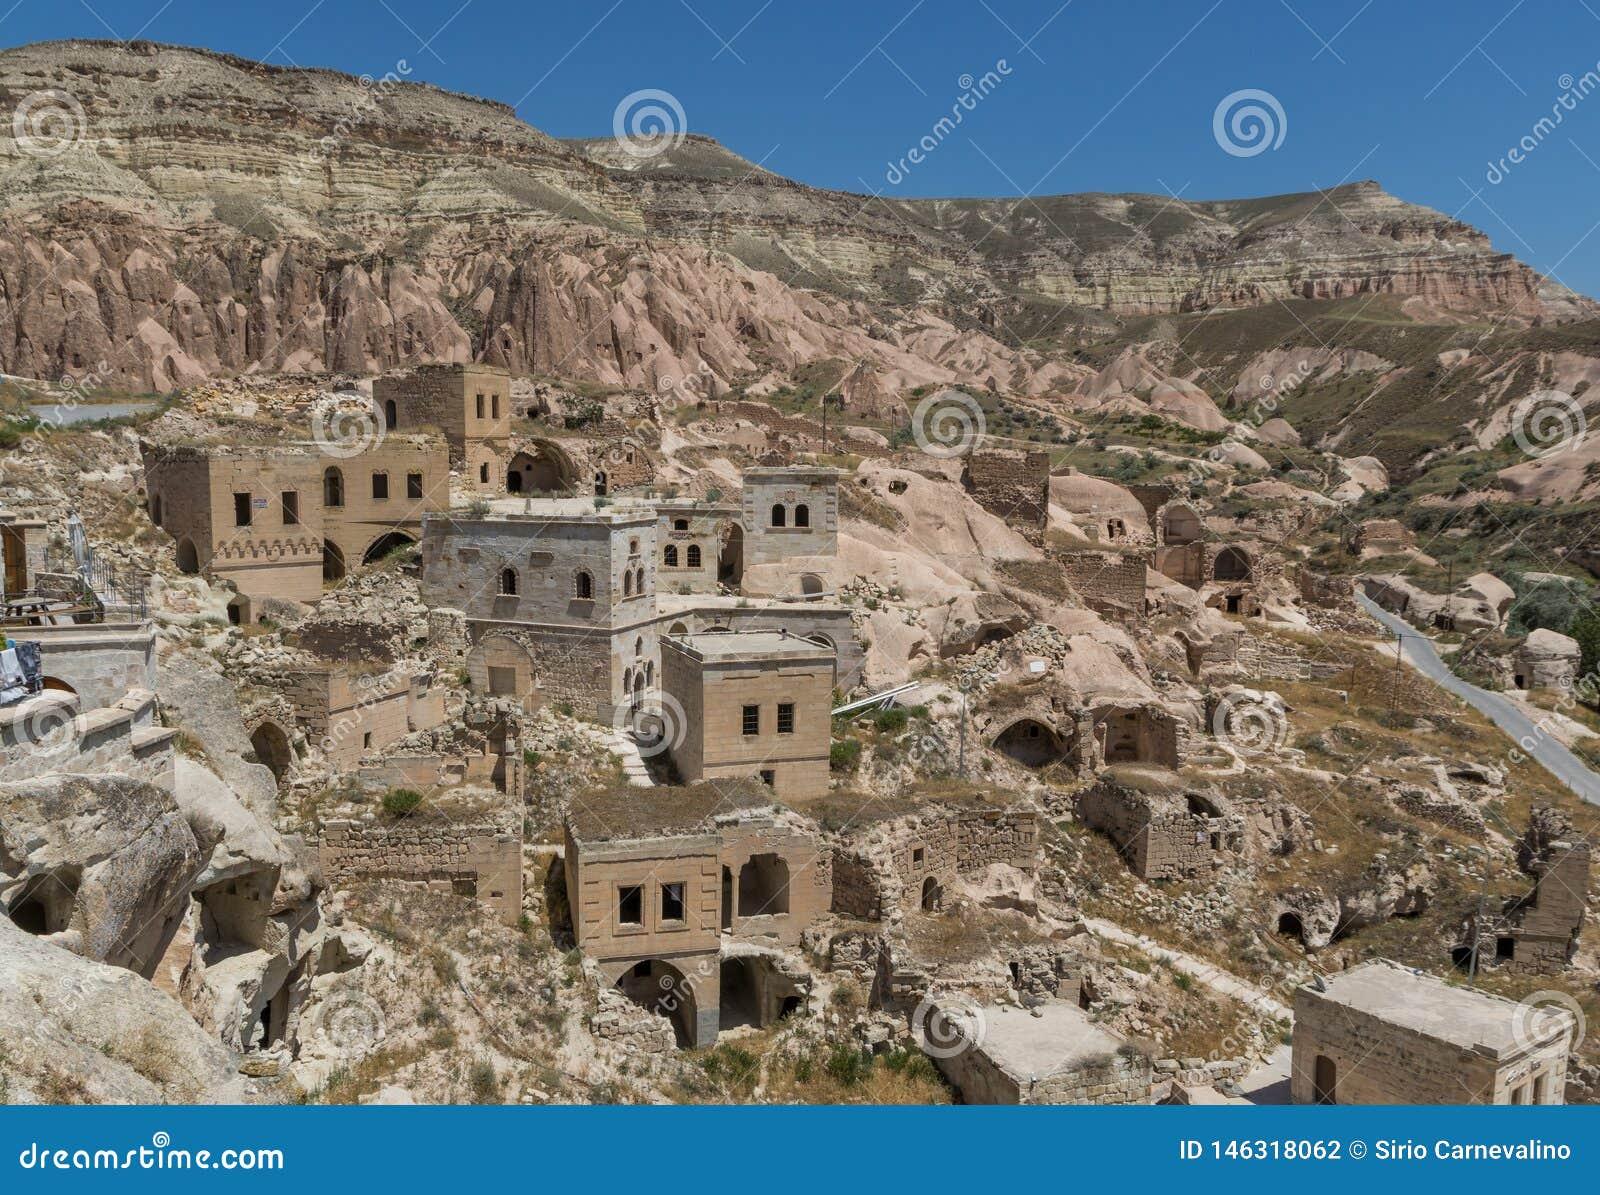 The wonderful landscape of Cappadocia, Turkey